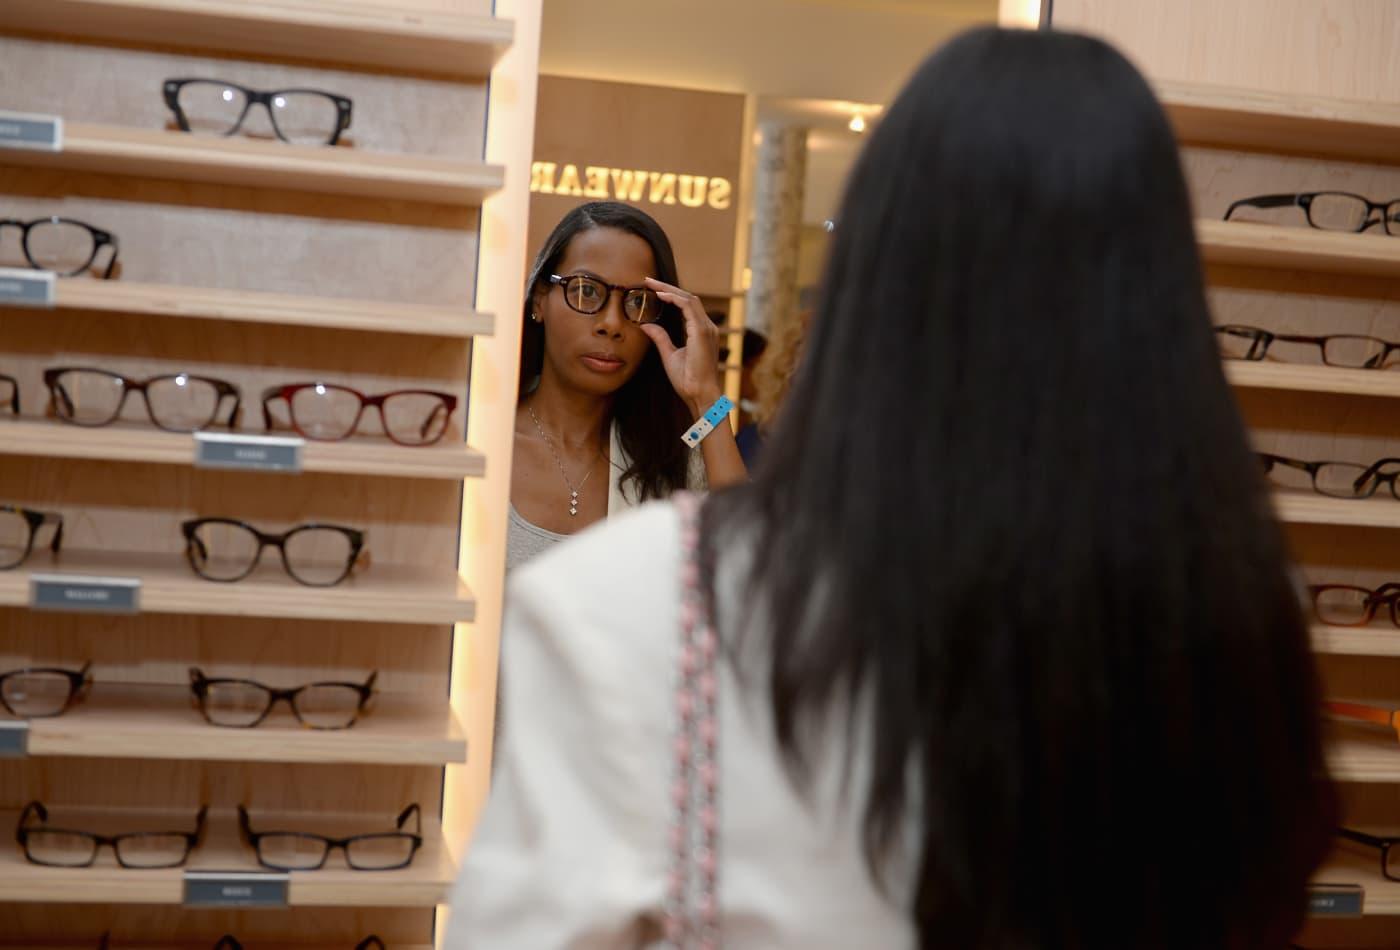 Rude awakening ahead for e-commerce brands like Warby Parker and Allbirds